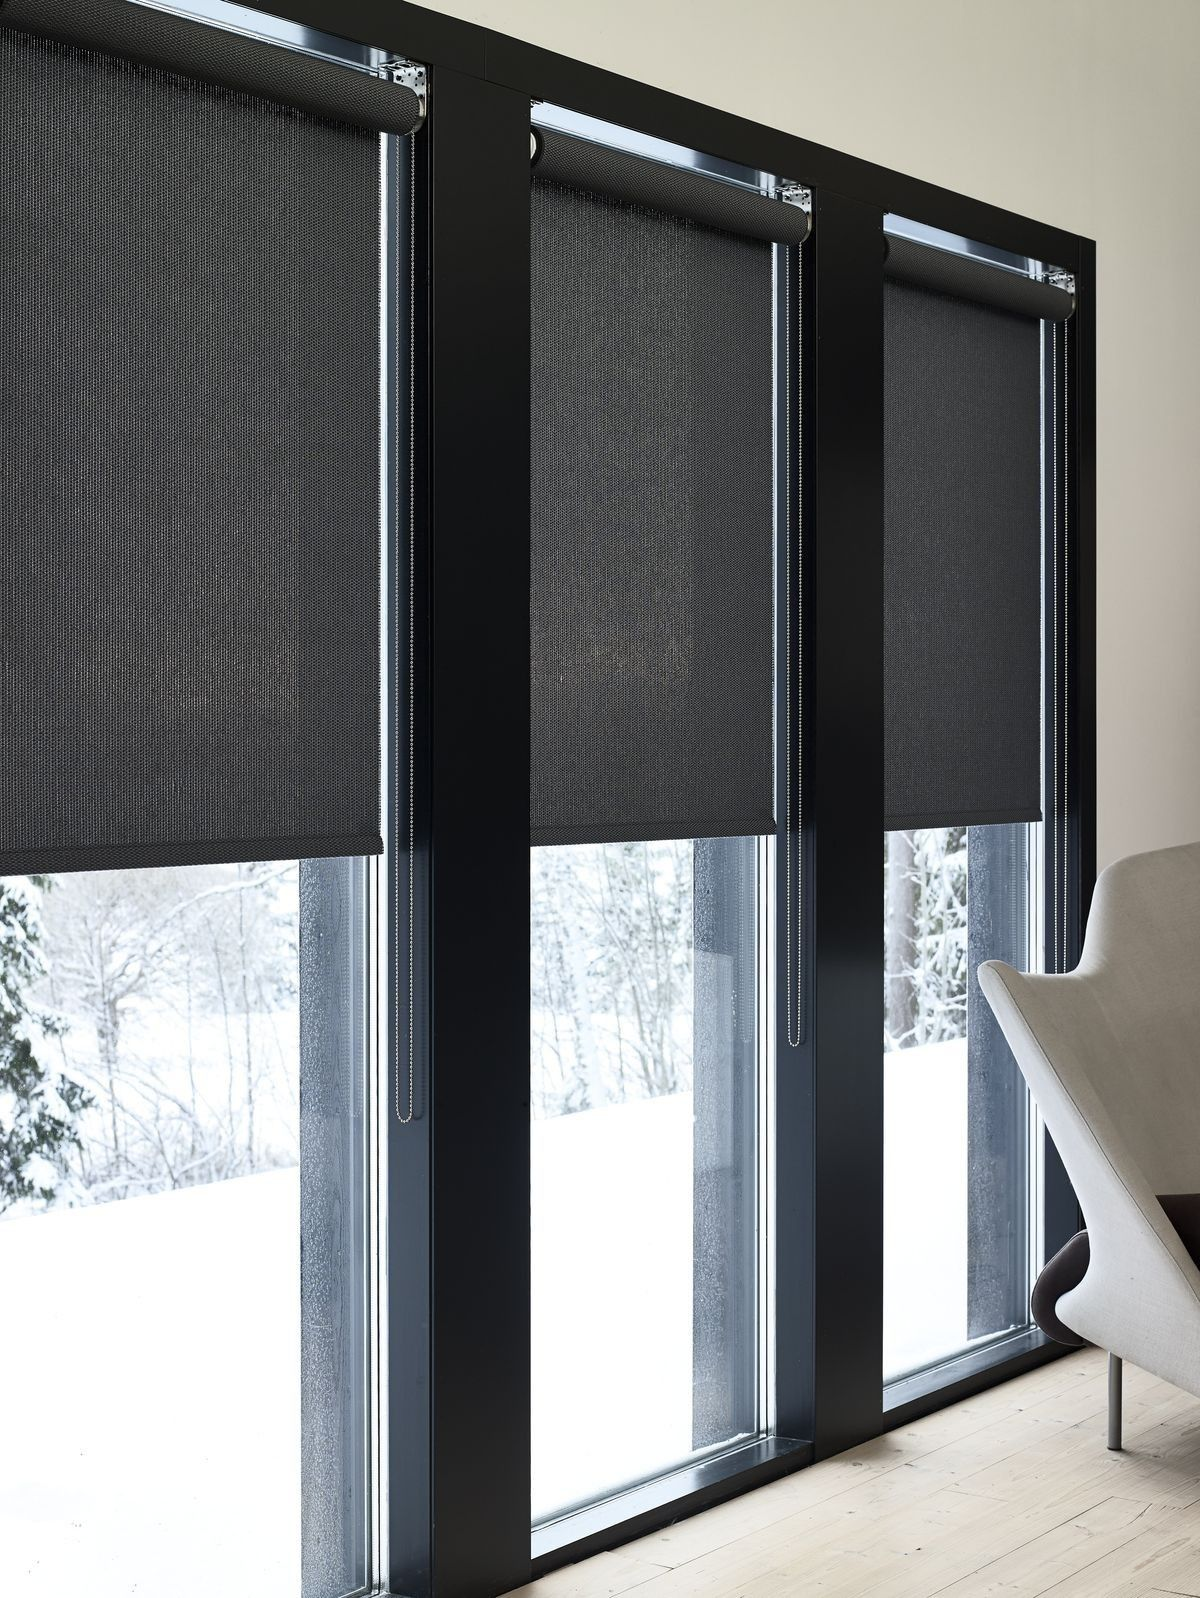 рулонные шторы жалюзи панорамные окна Verteluxru